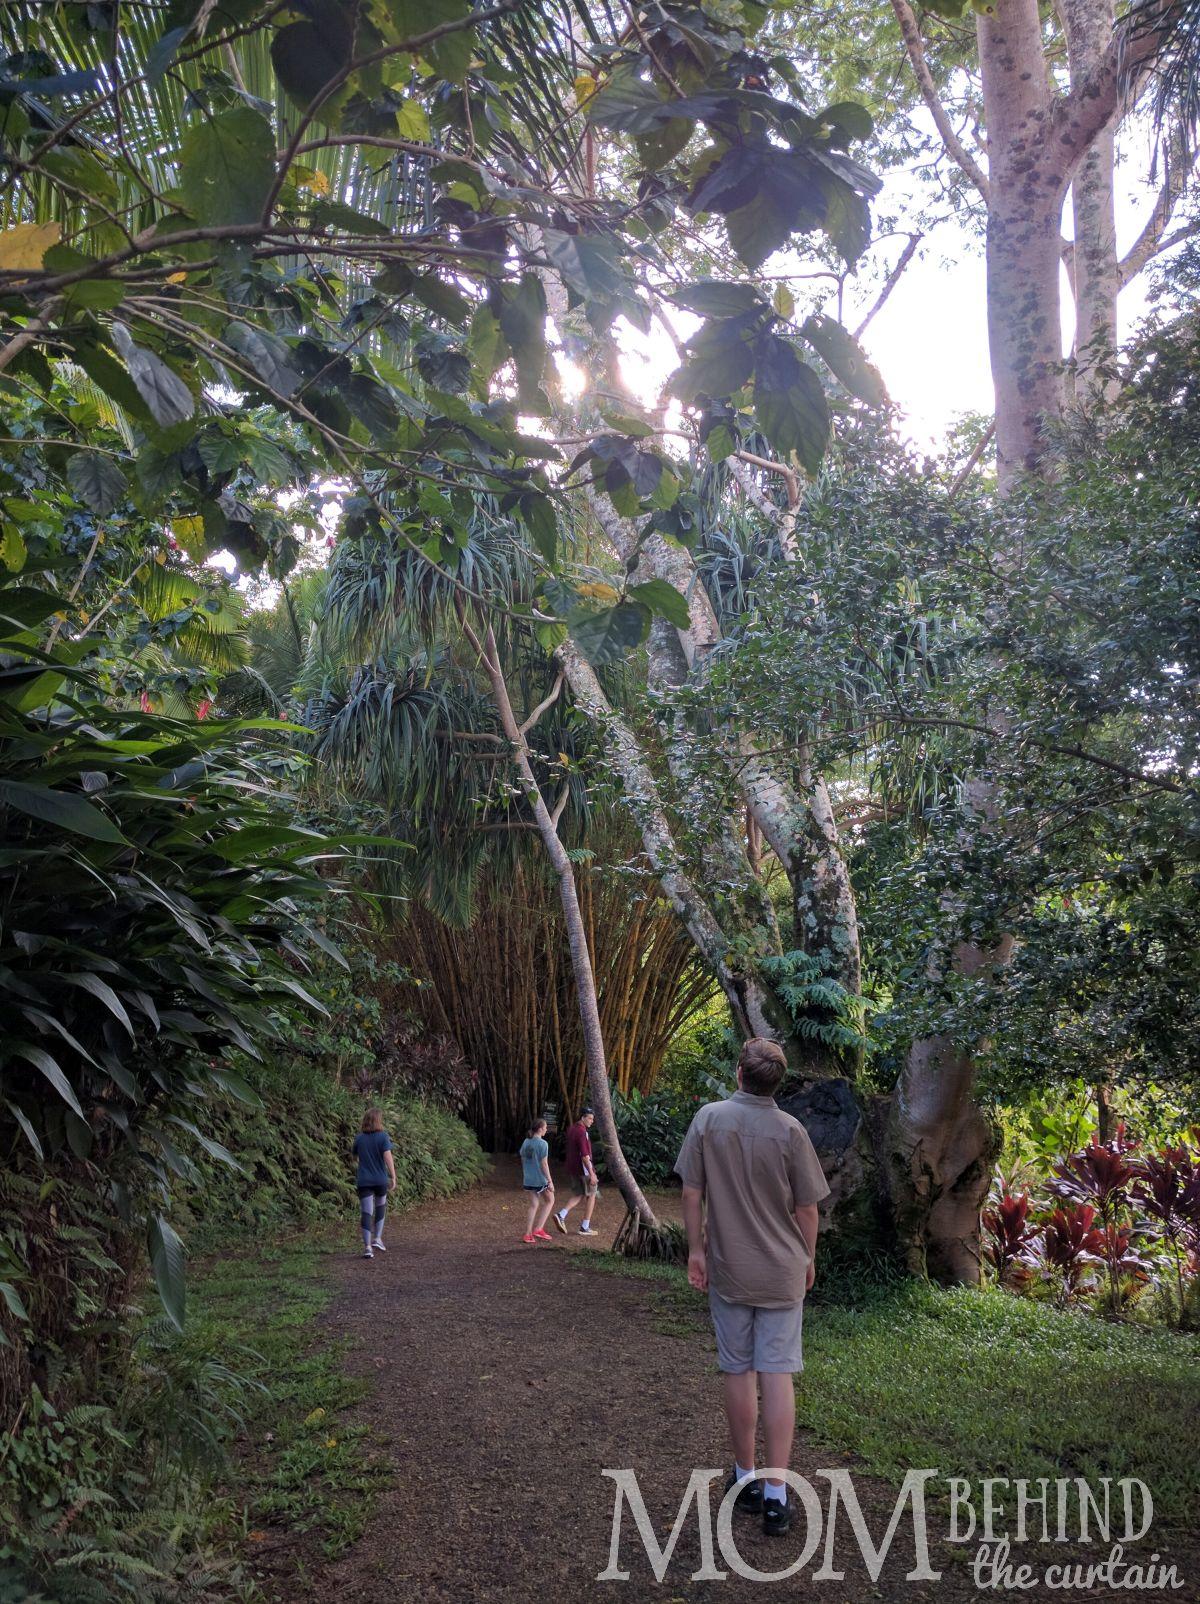 Easy walking hikes in Maui's Garden of Eden.